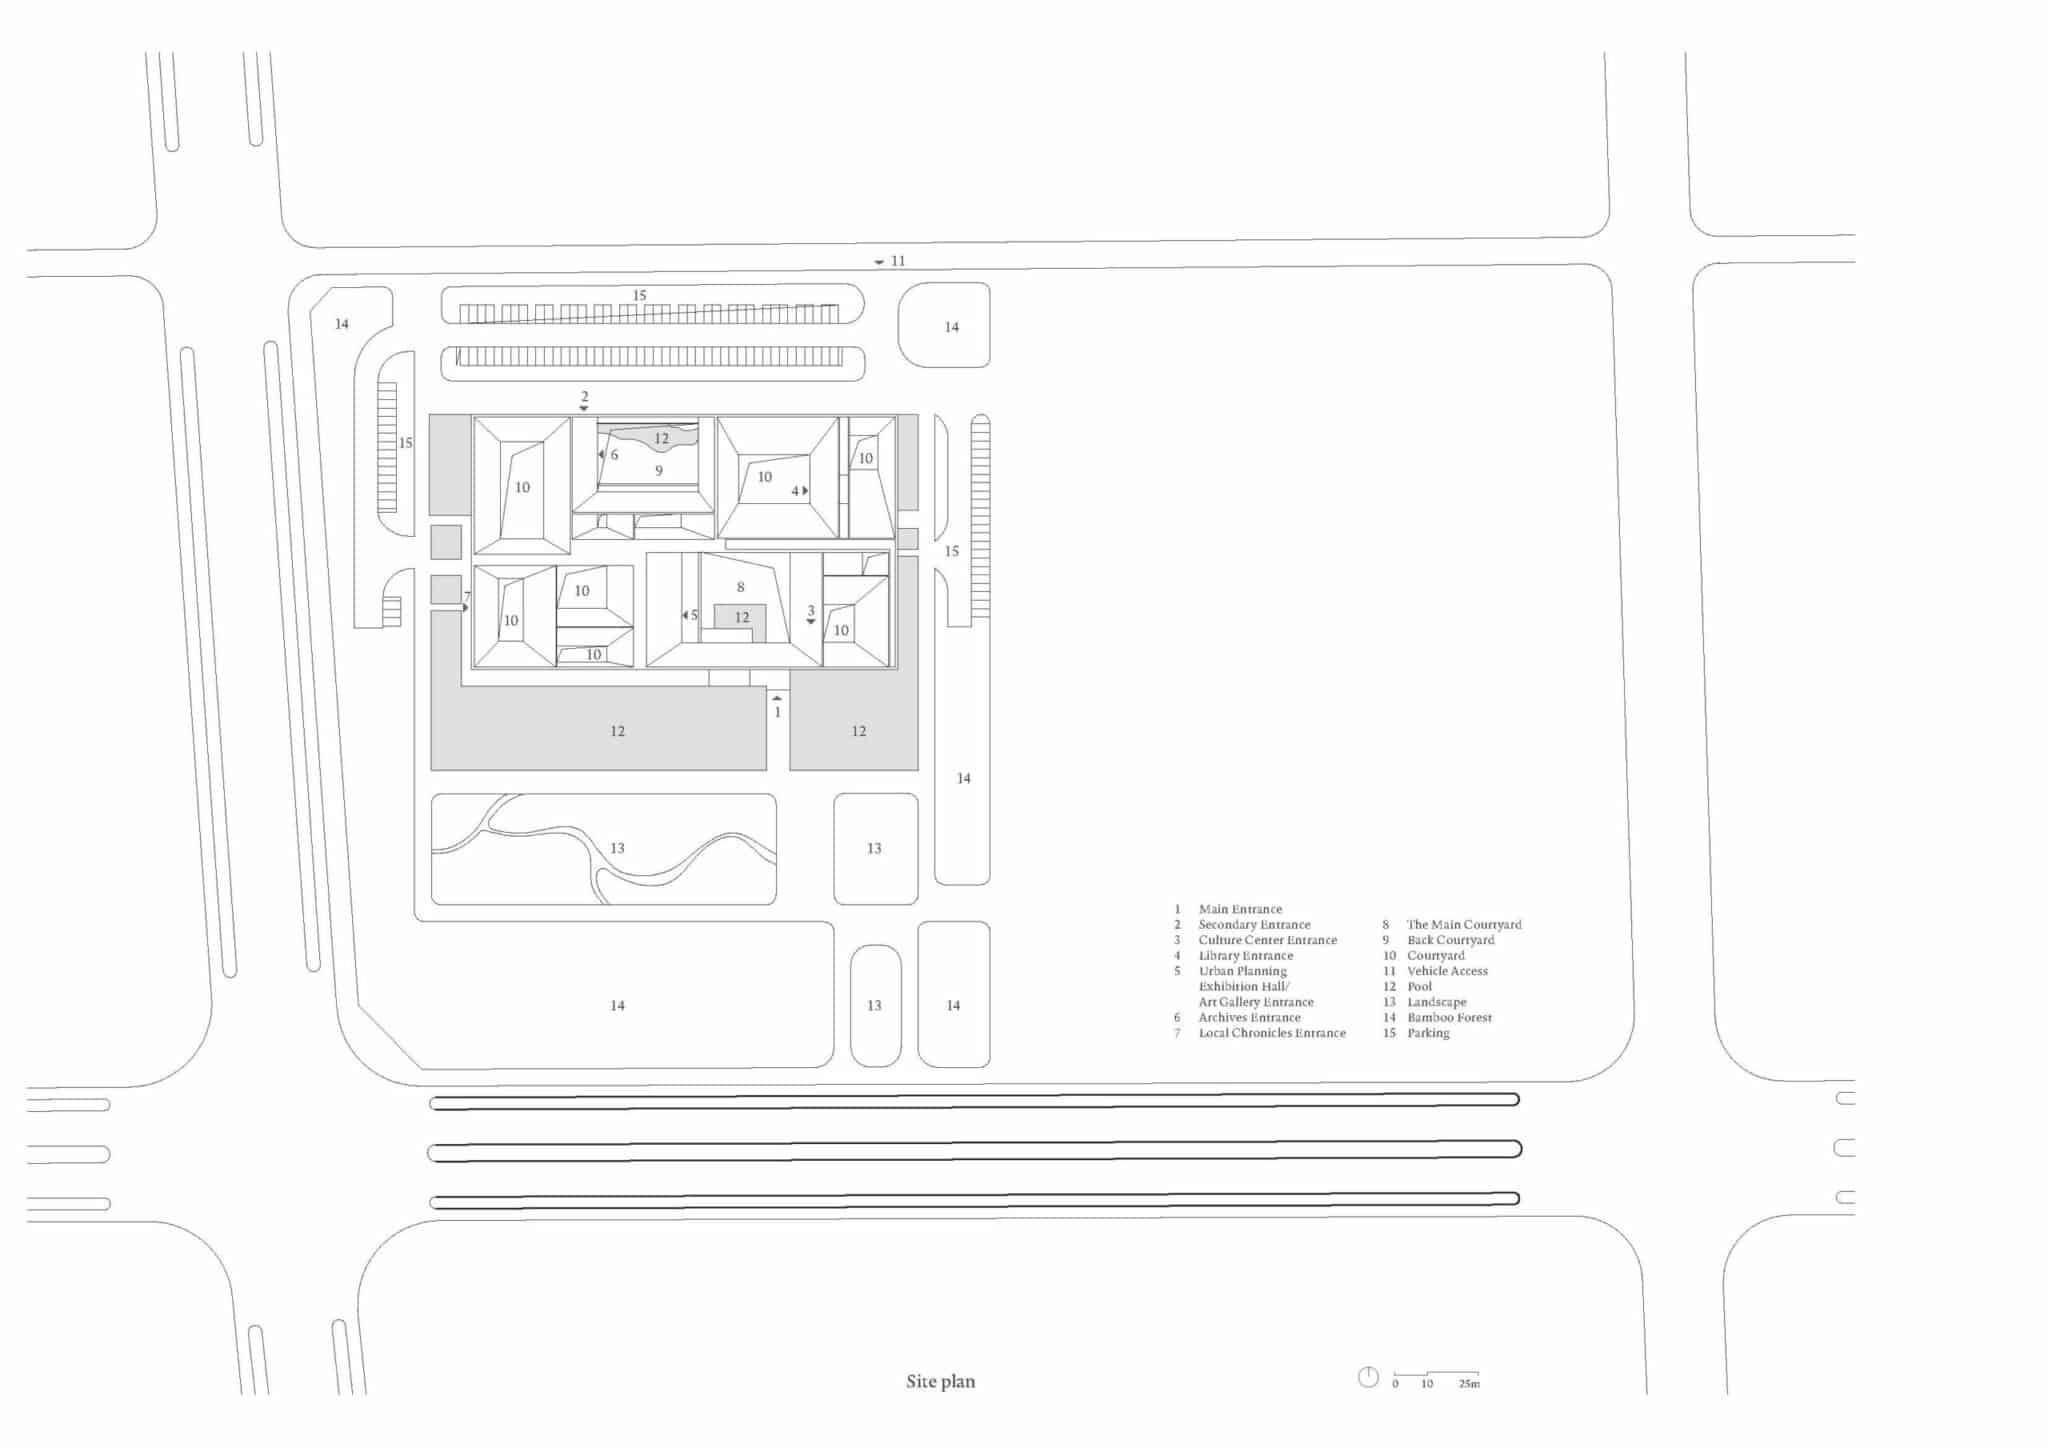 Shou County Culture and Art Center  - 20210702 Zhu Pei ShouCountyCultureArtCenter 12.1 scaled 59